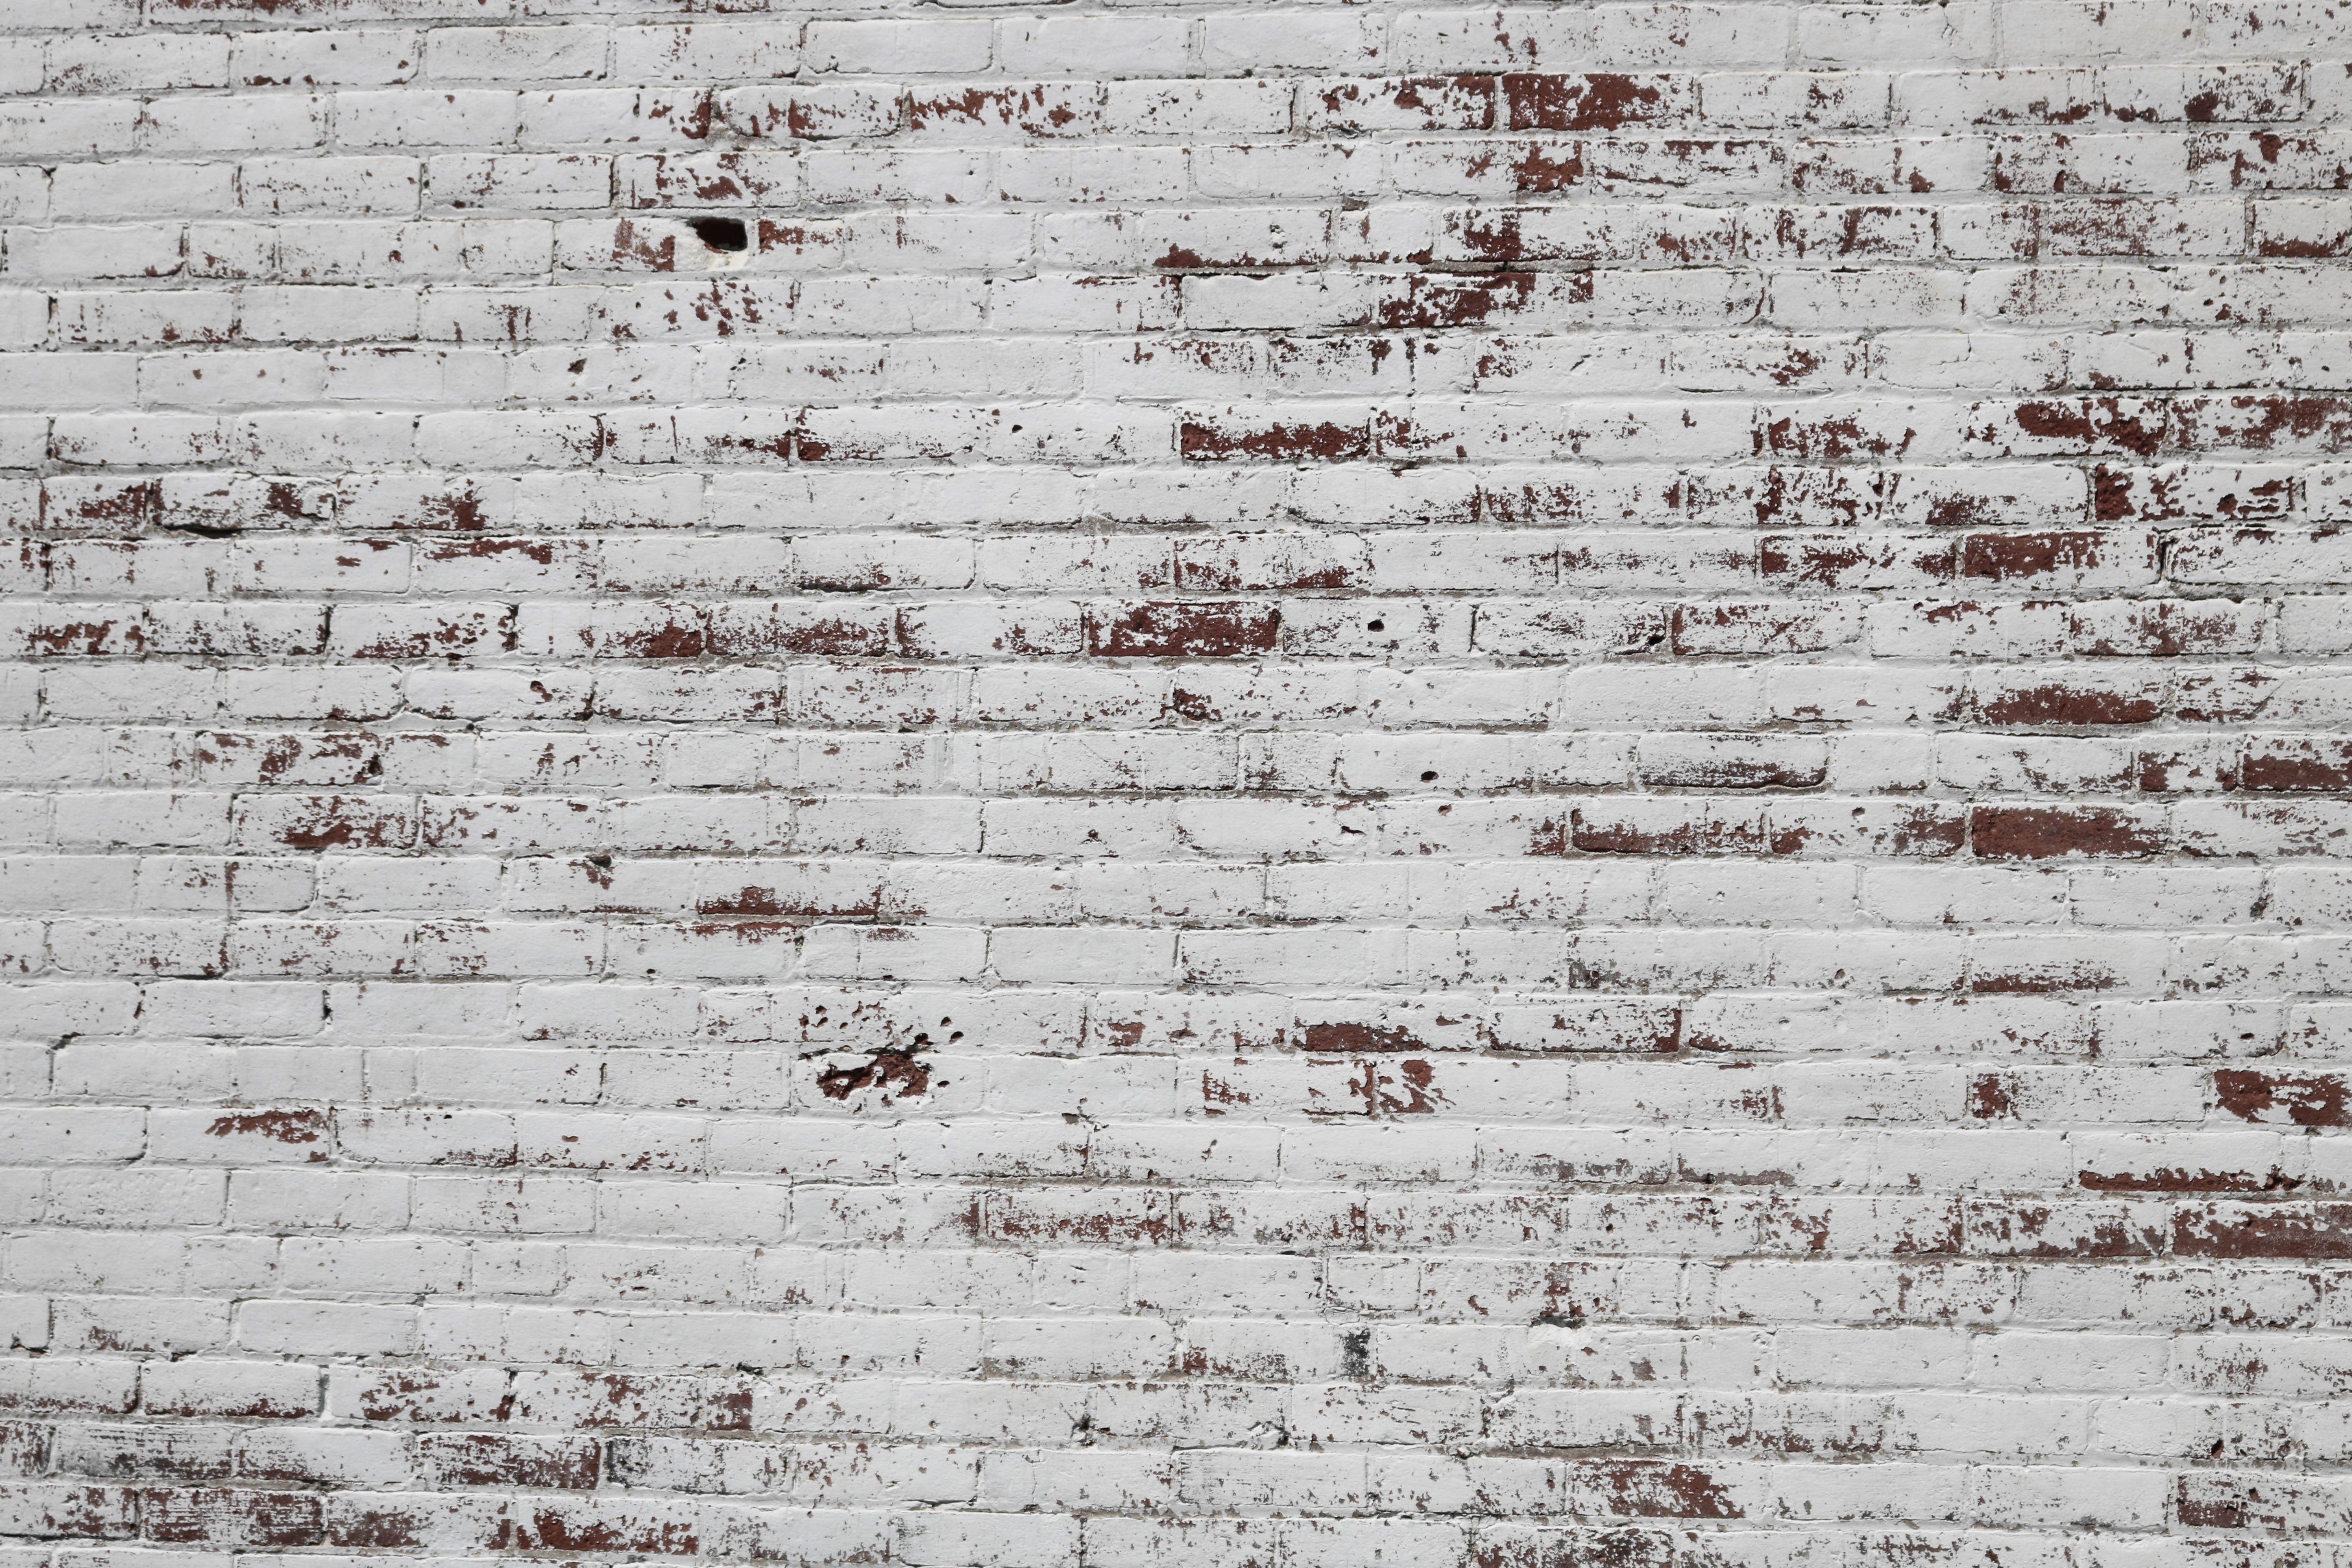 Wall Brick White And Painted Hd Photo By Sydney Zentz Srz On Unsplash Painted Brick Walls Painted Brick Brick Wall Wallpaper